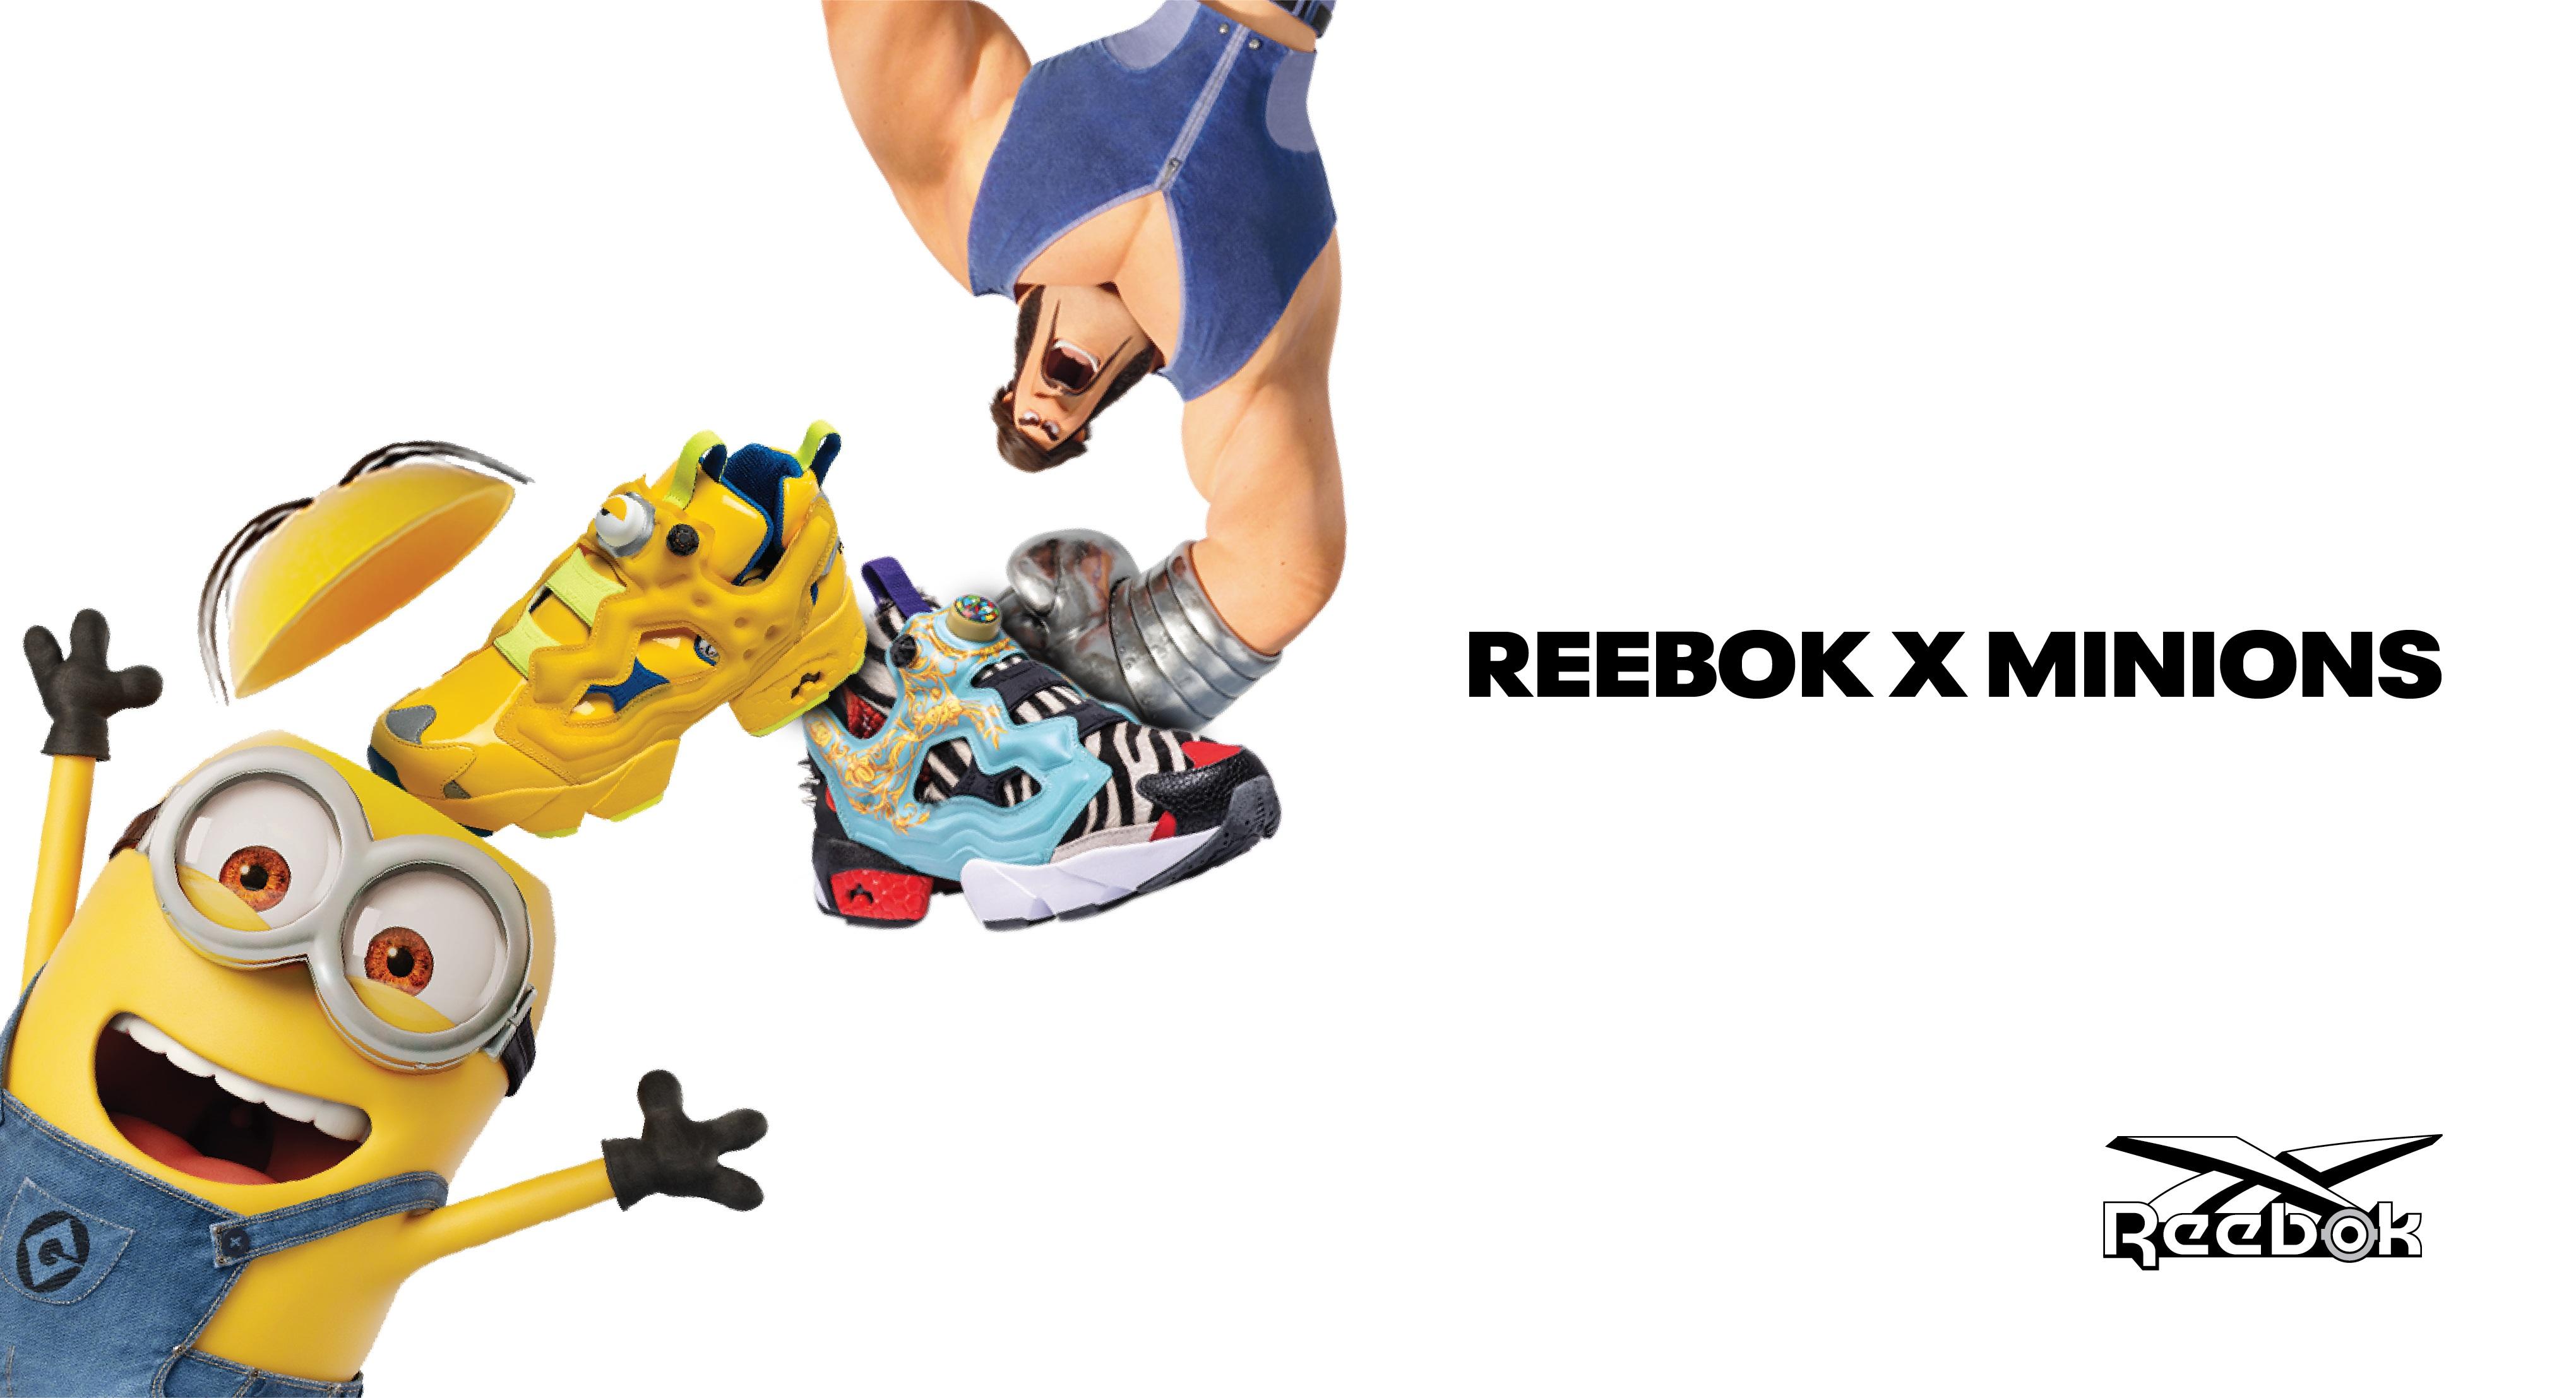 giày thể thao (1-8.10.2020-minions-reebok-instapump-fury1 (4)